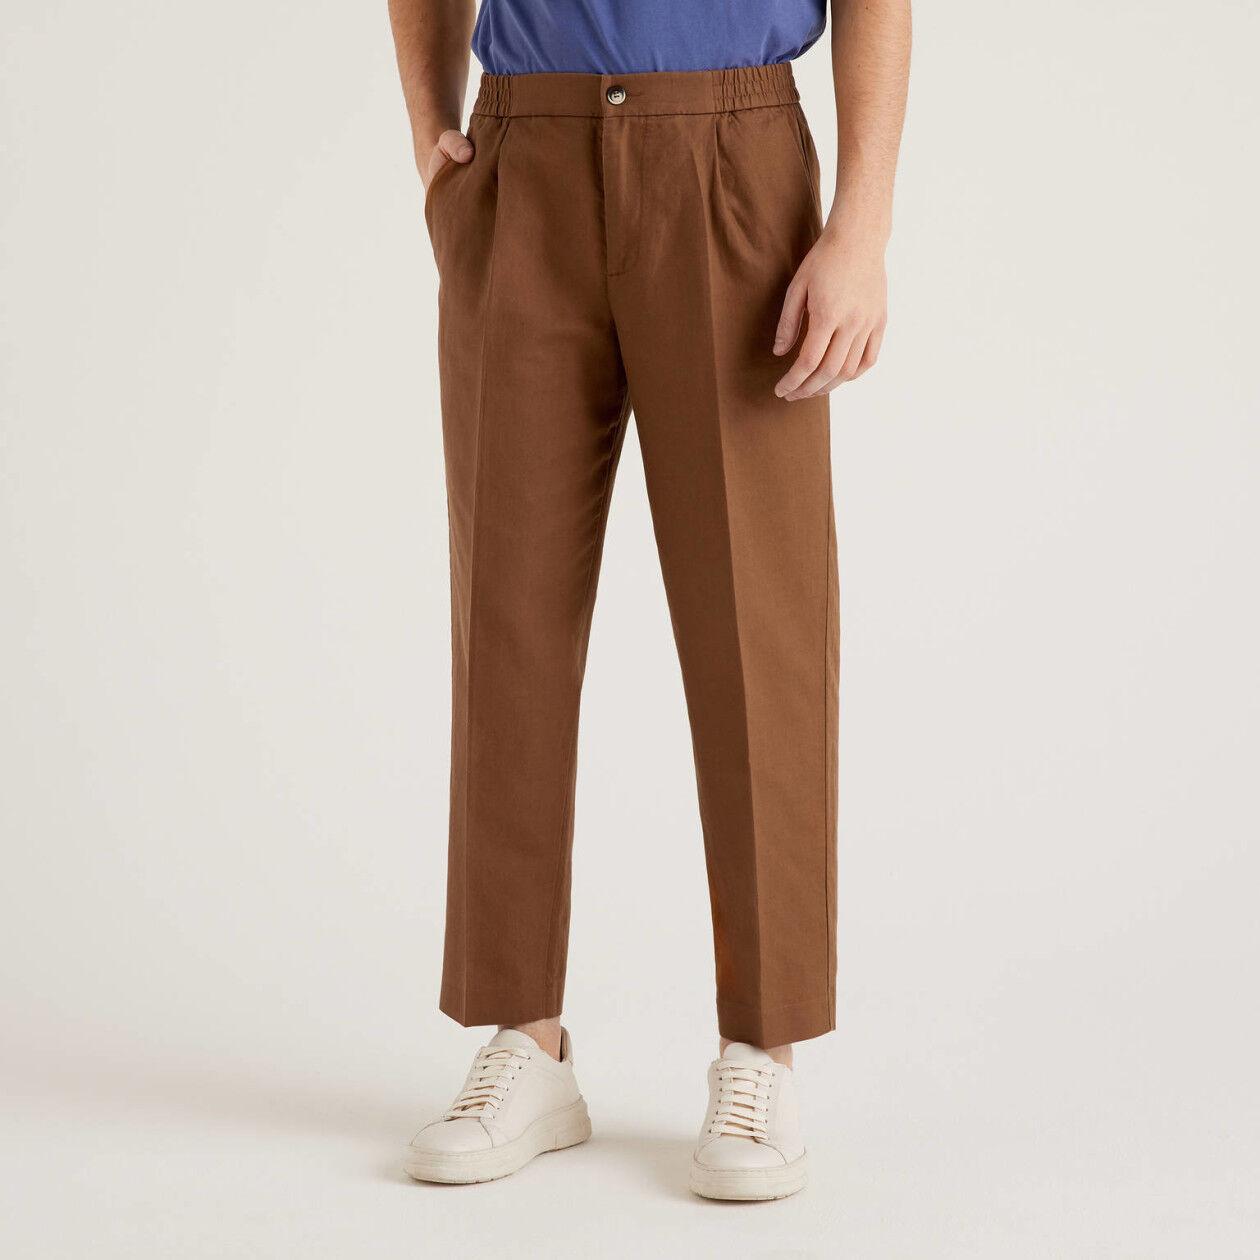 Pantaloni misto lino con elastico in vita